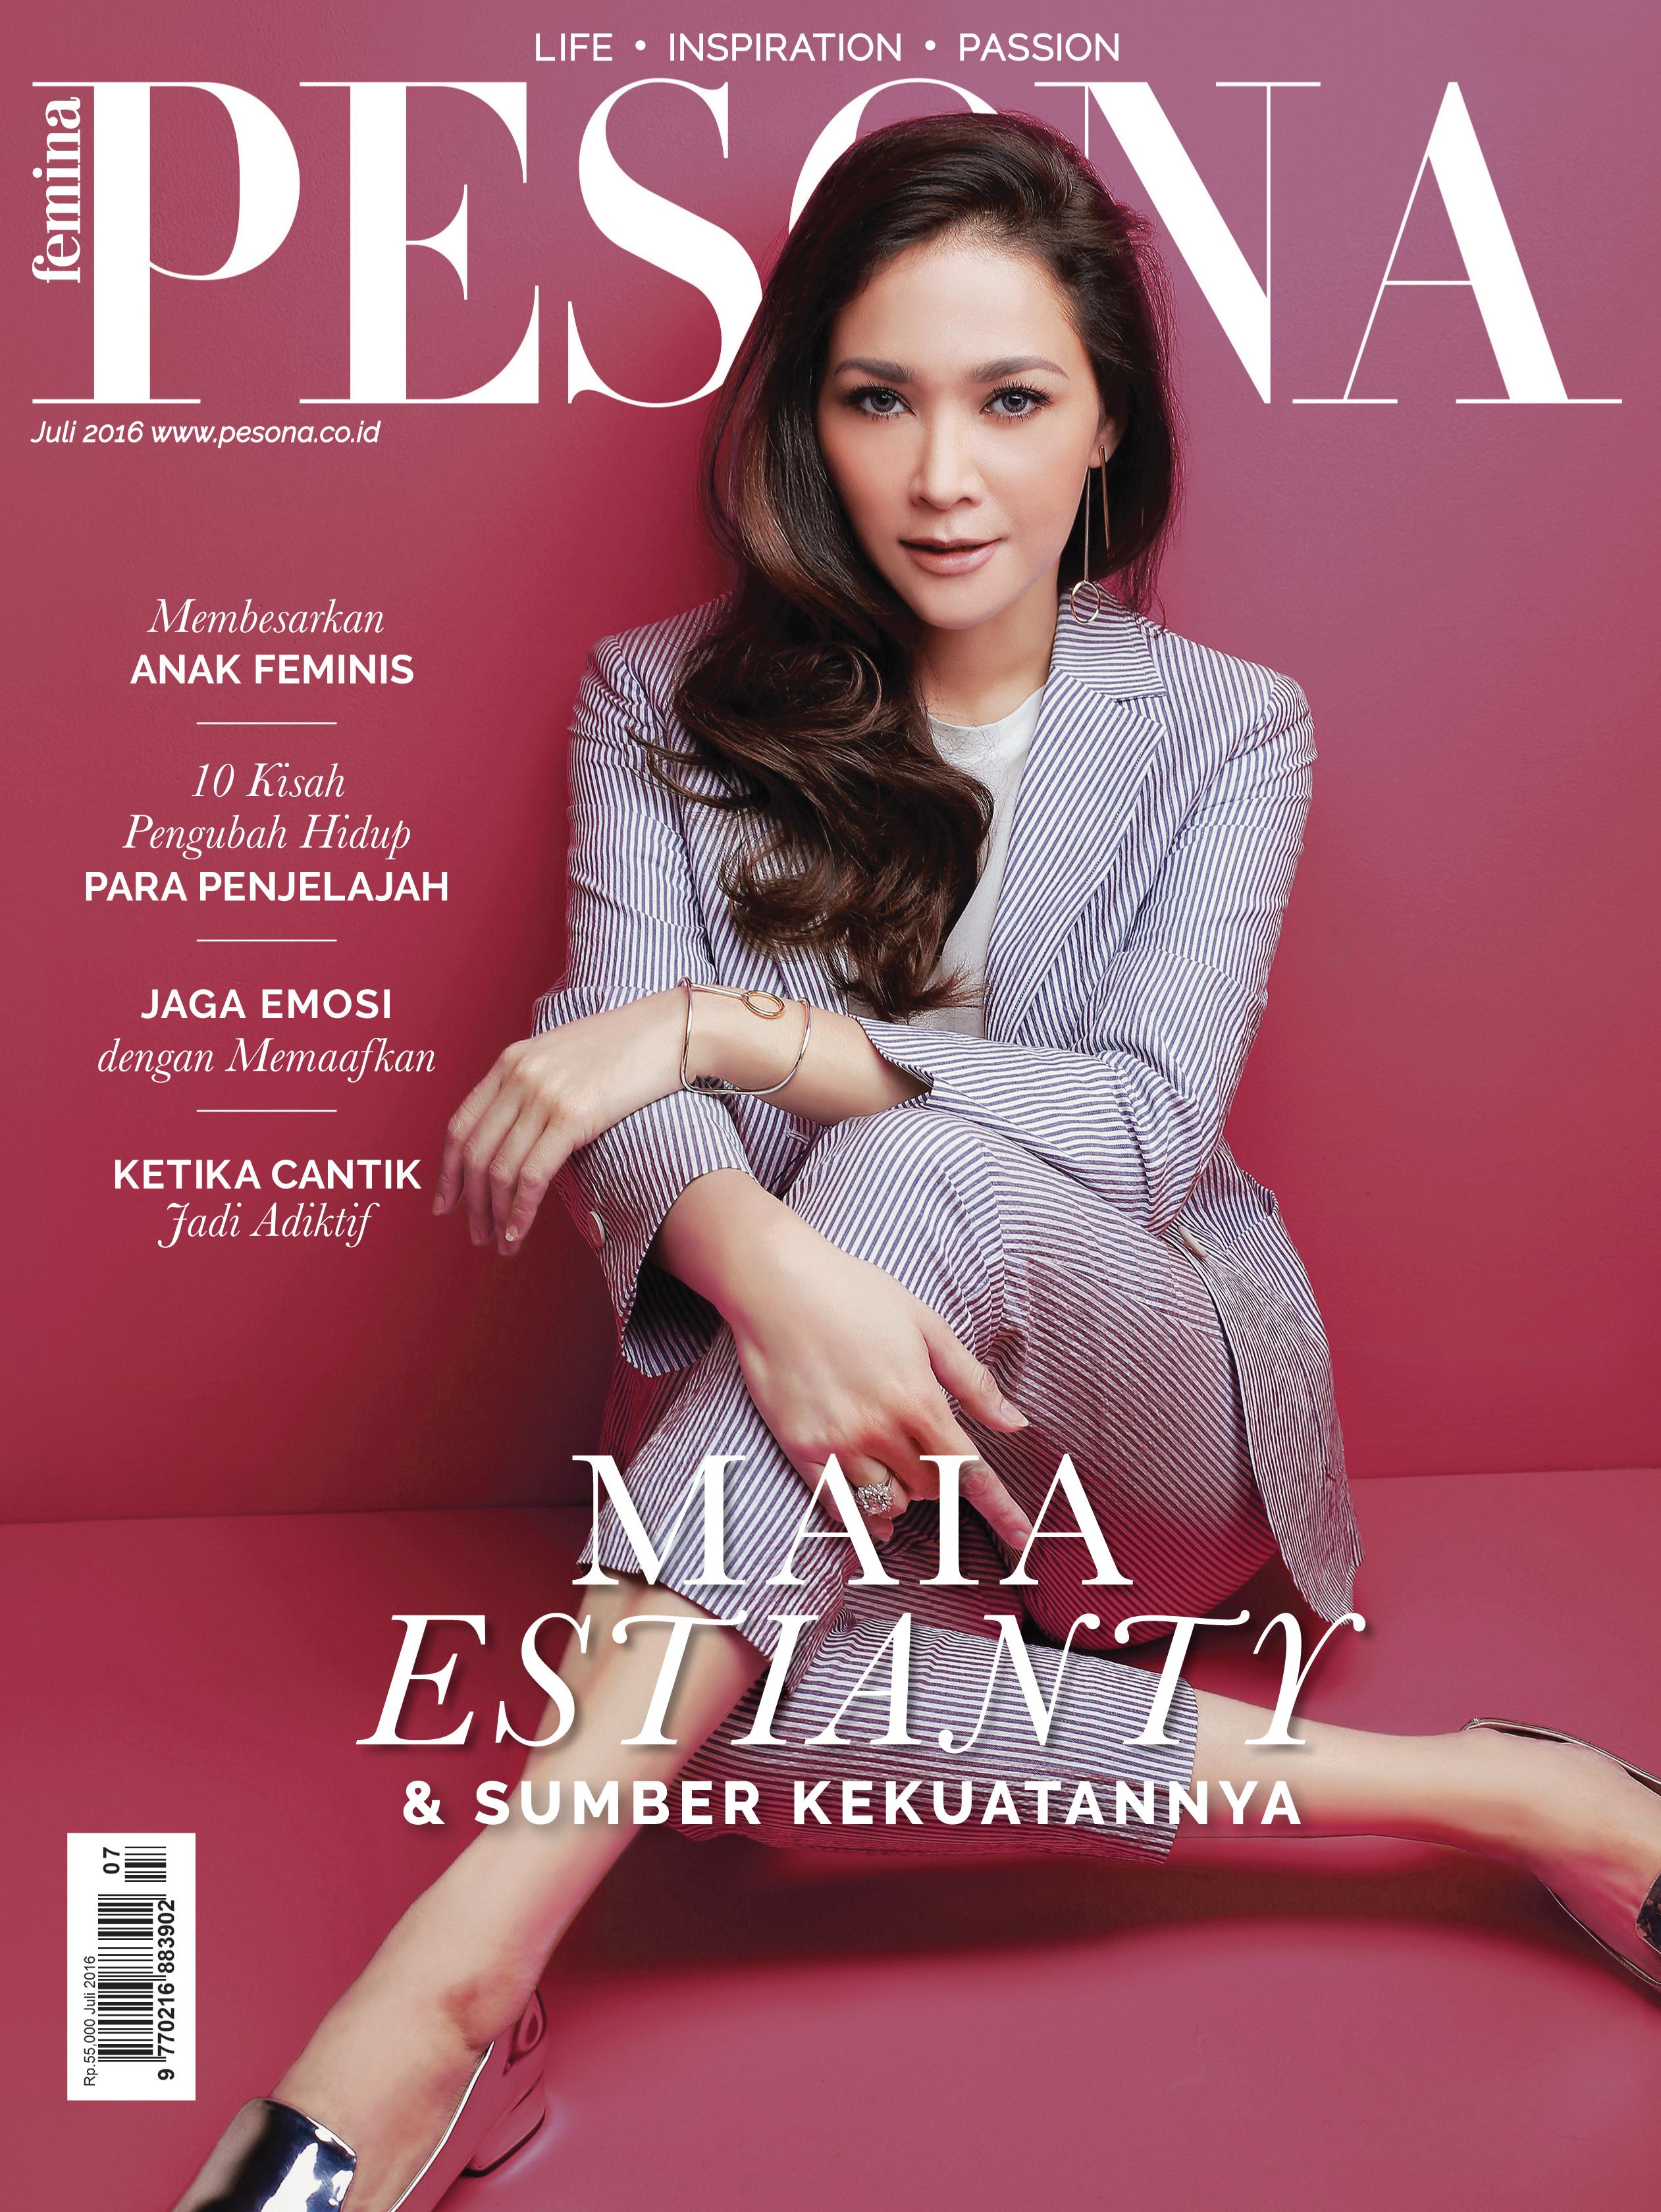 Pesona Edisi Juli 2016